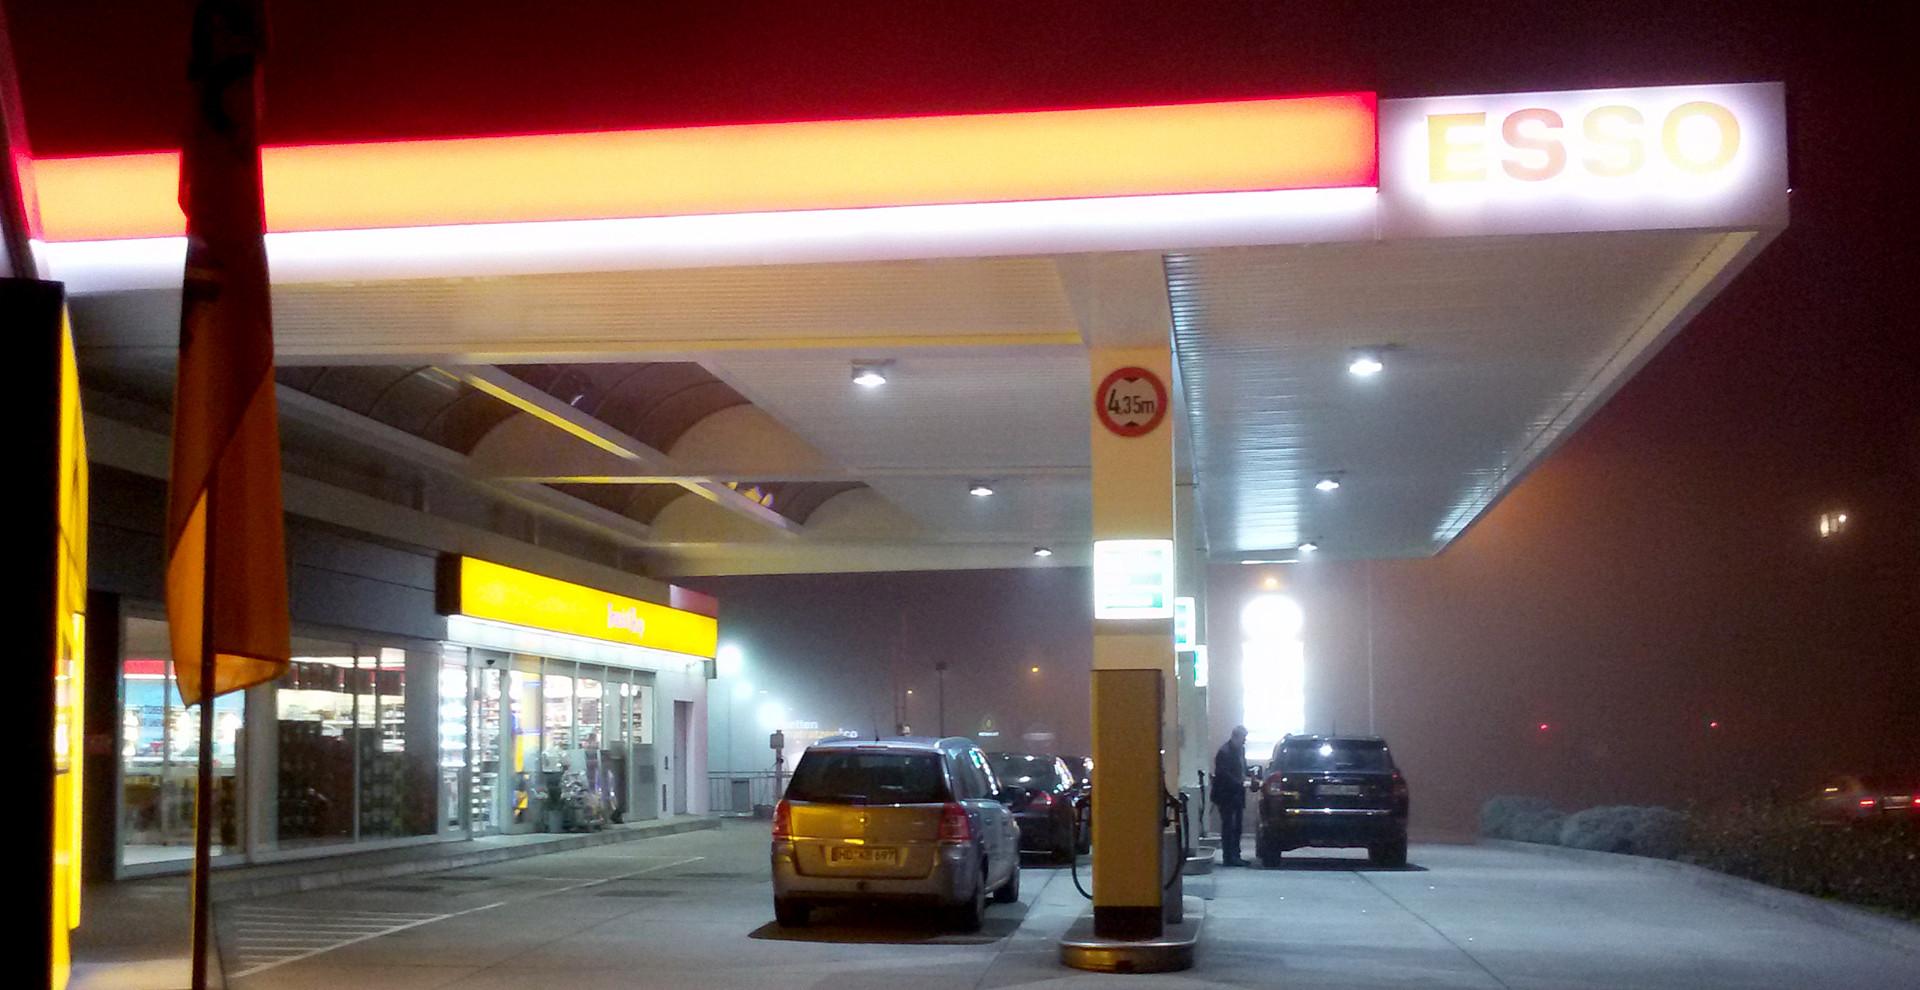 Lackierung Tankstellendach ESSO Lützelsachsen